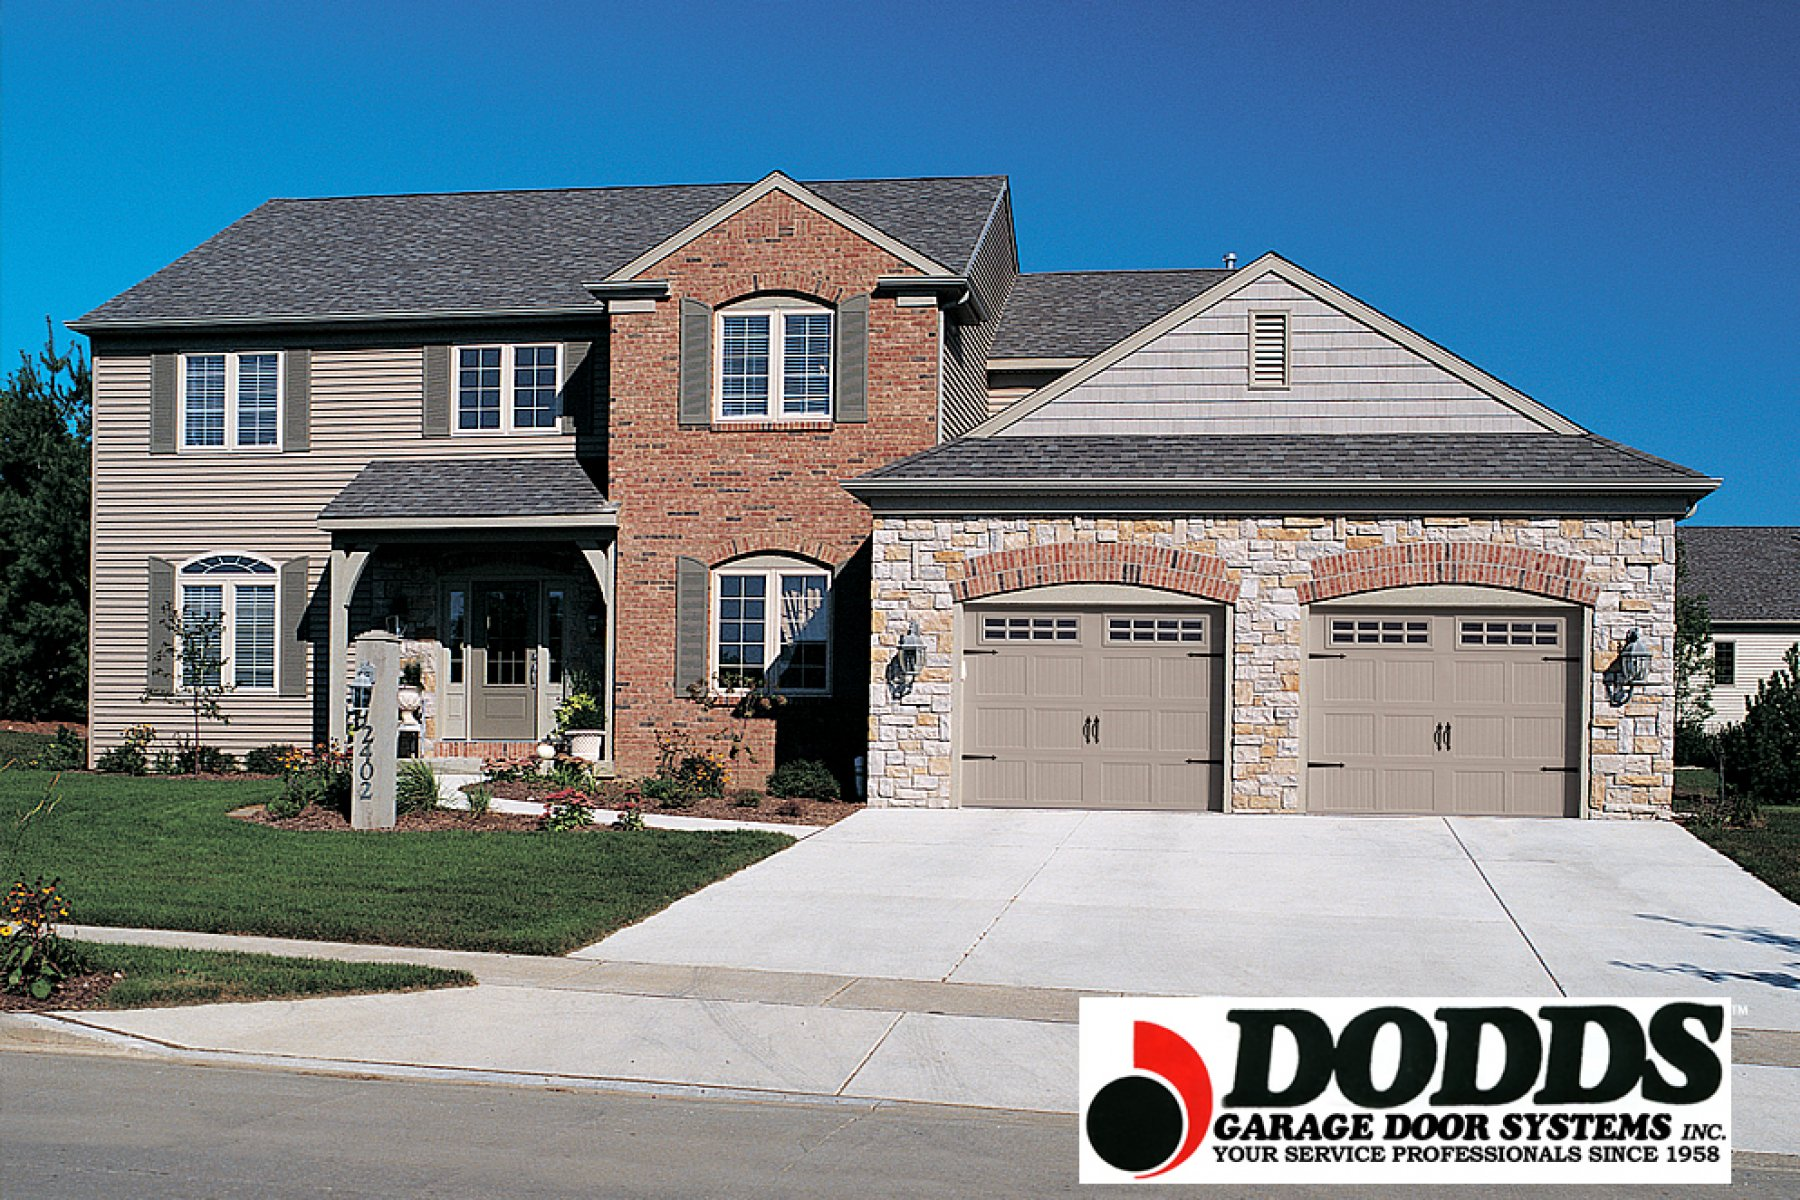 BESbswy. & Dodds Garage Door Systems Inc | ? - 4.9/5 - 54 Reviews | 346 ... pezcame.com